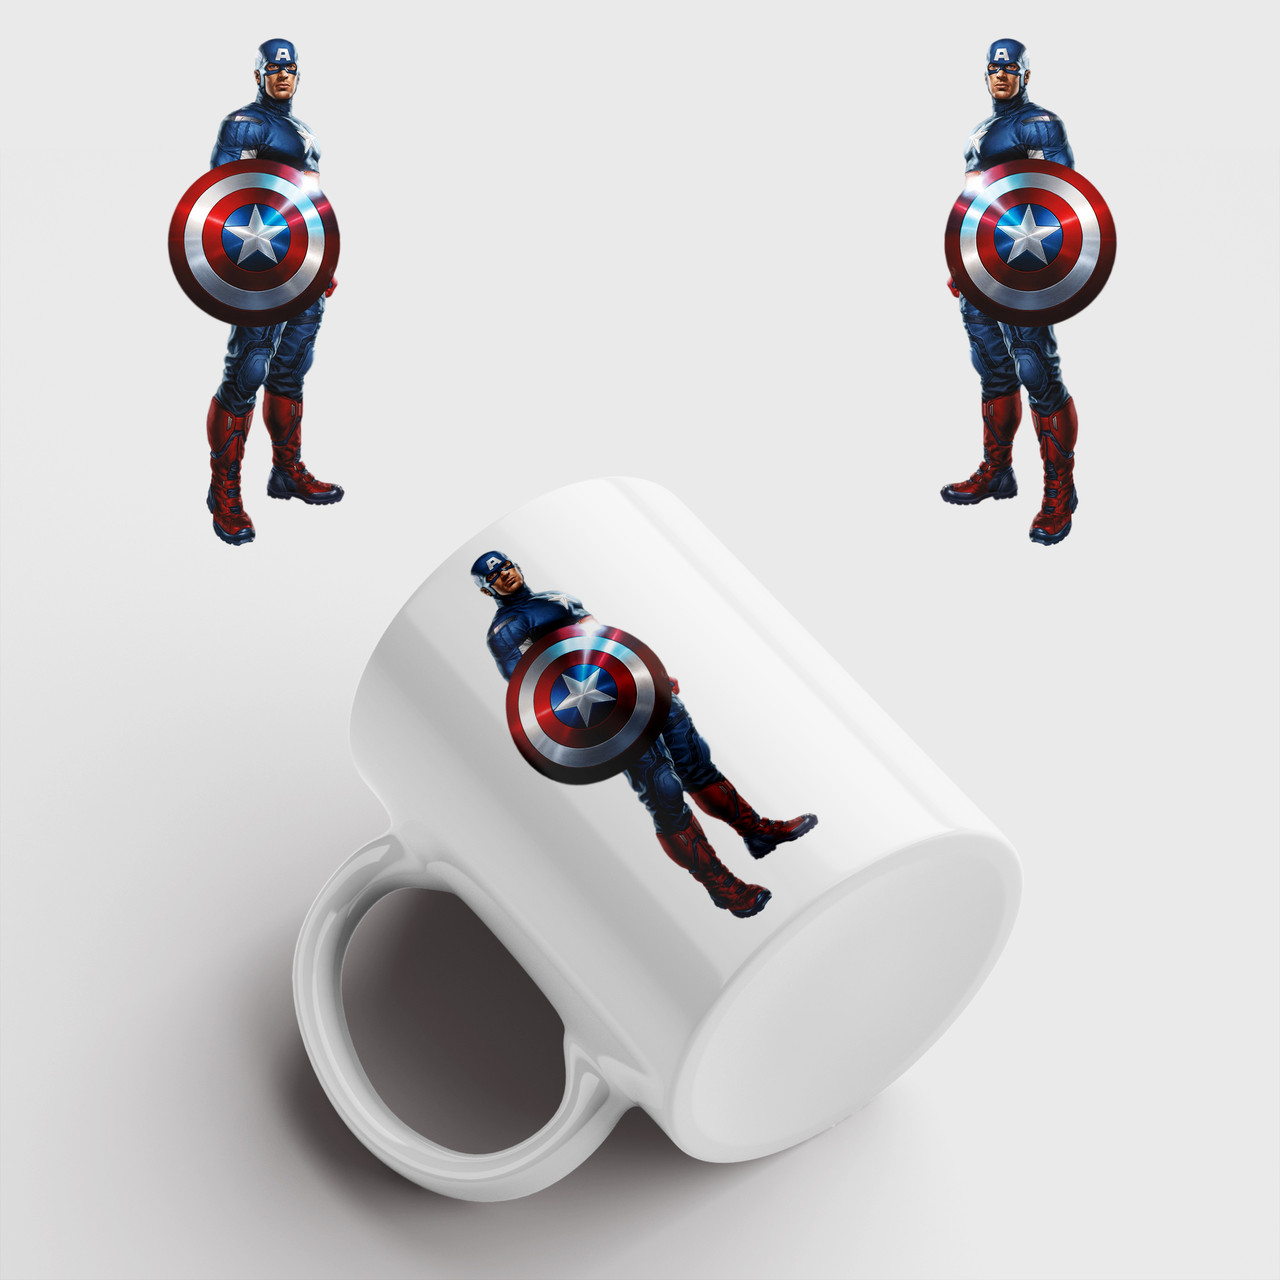 Кружка с принтом Капитан Америка. Captain America art. Marvel. Чашка с фото